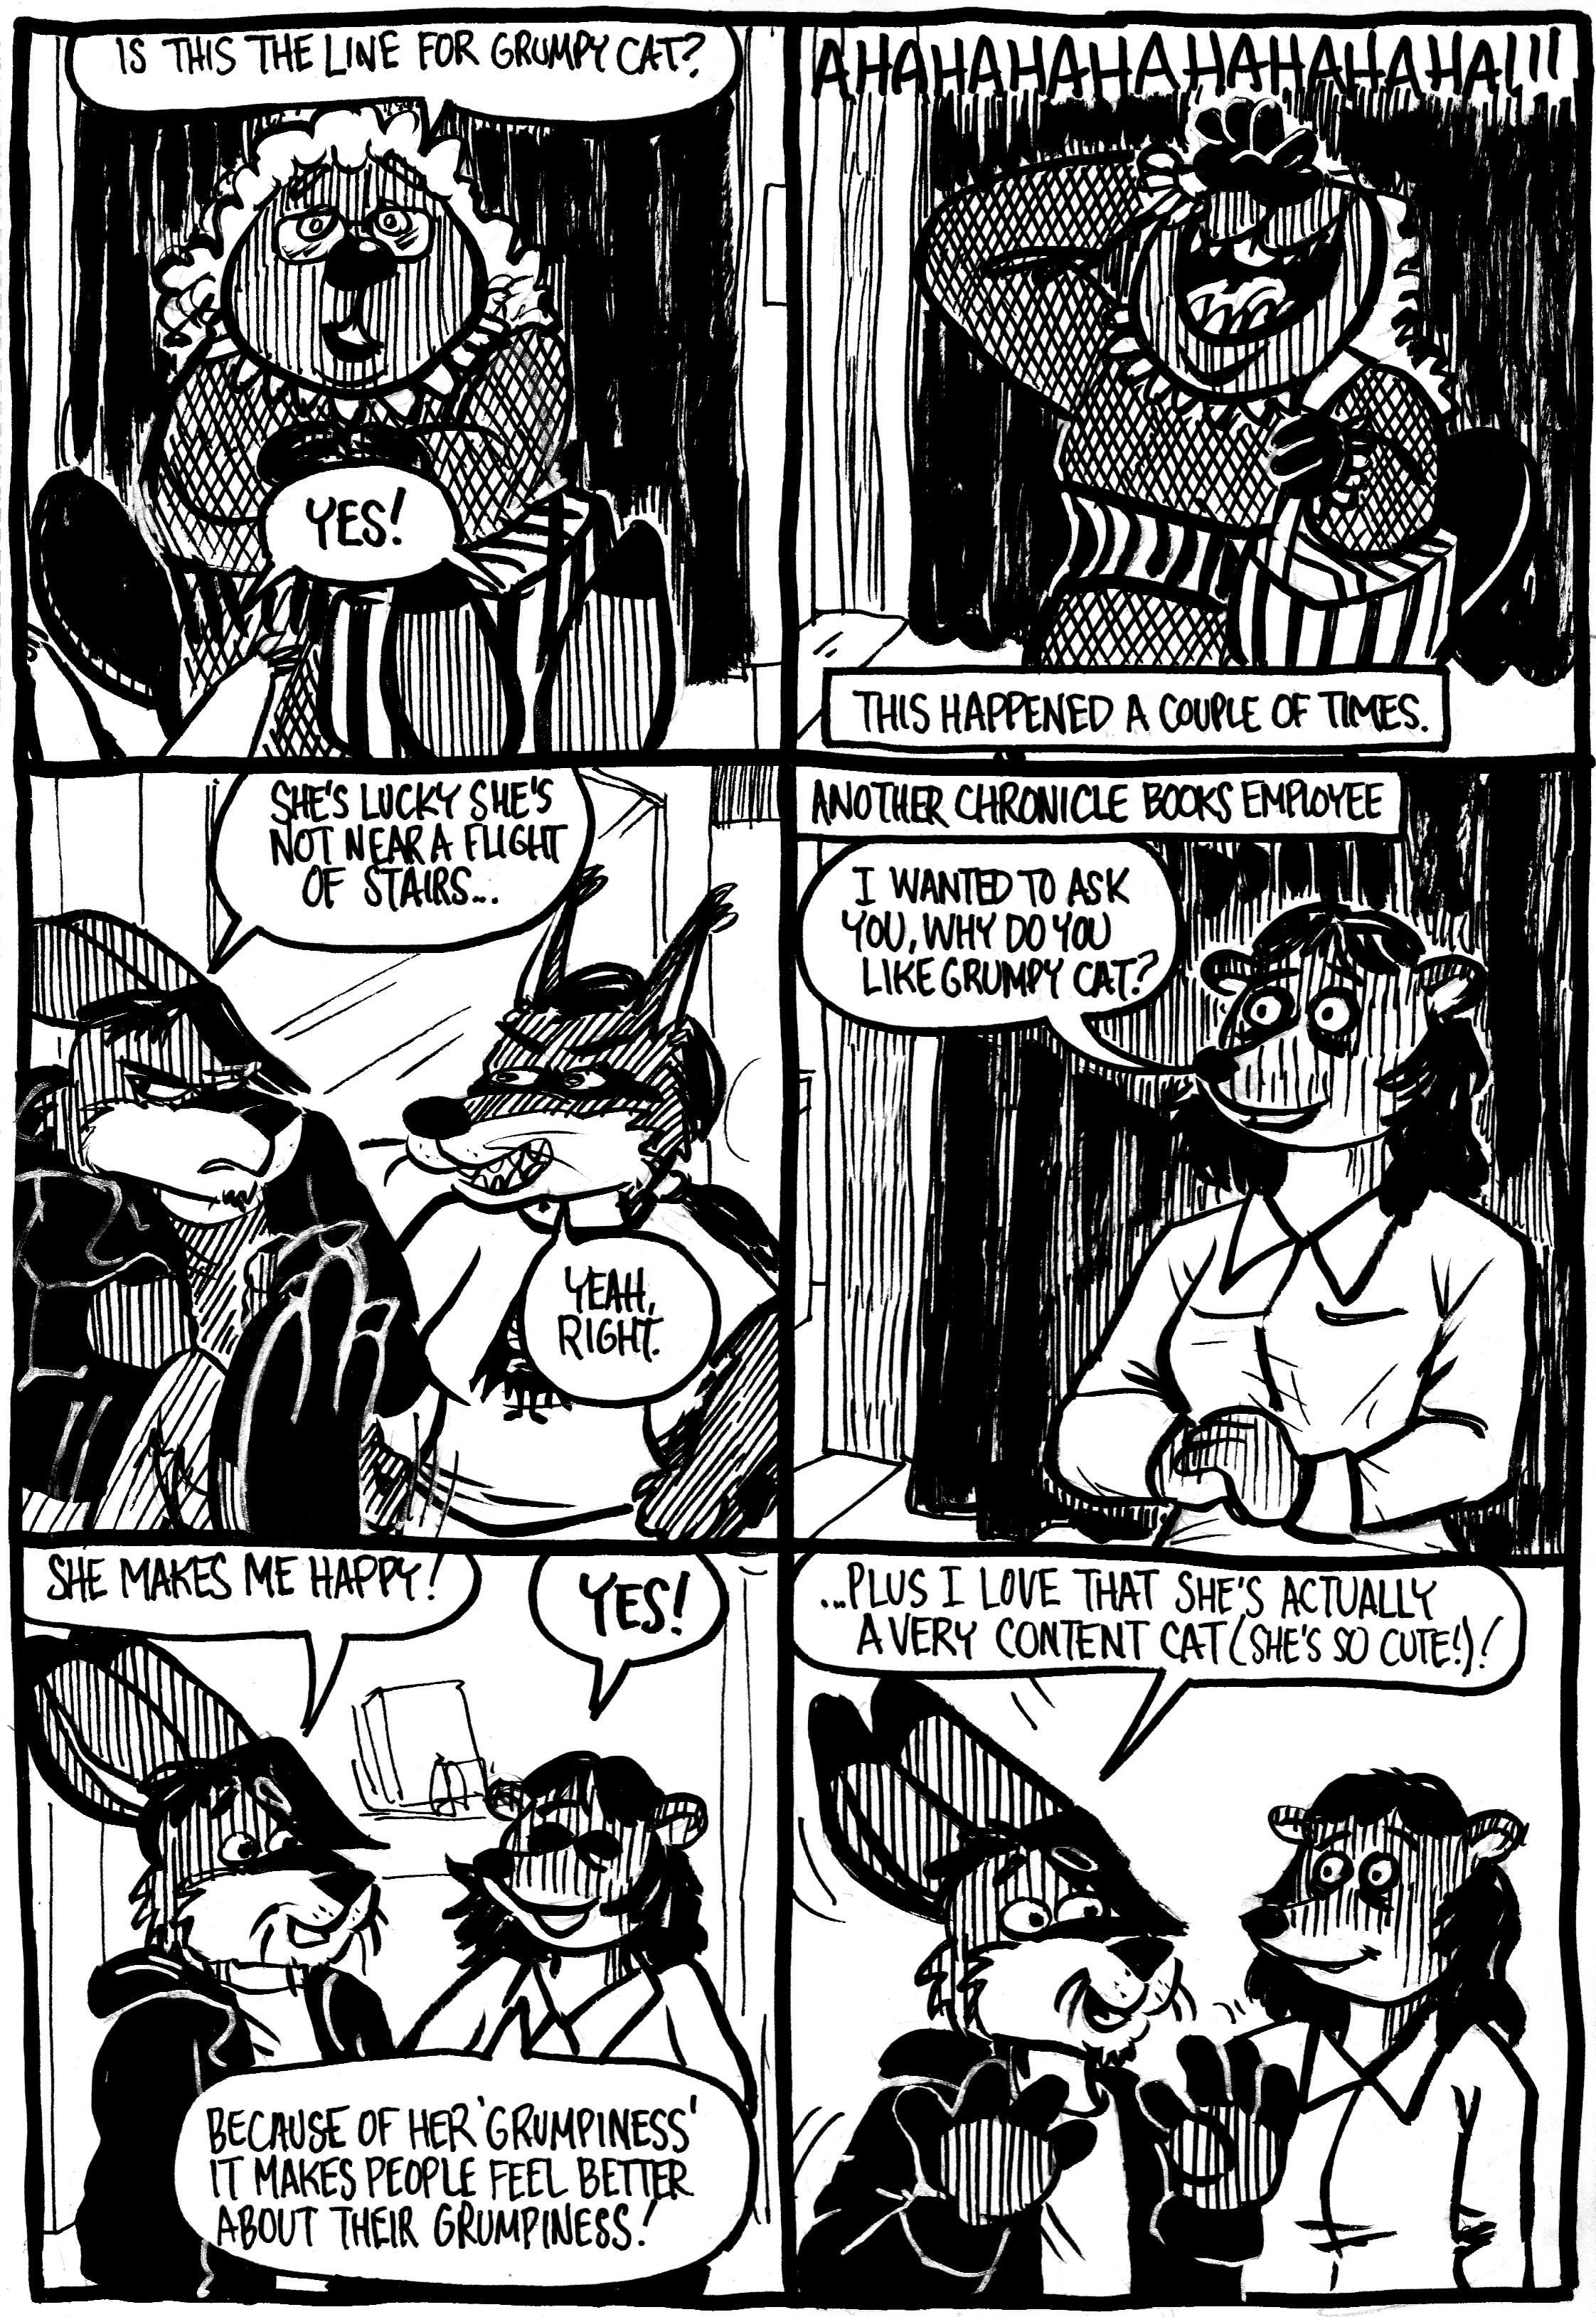 Meeting Grumpy Cat, Part 4